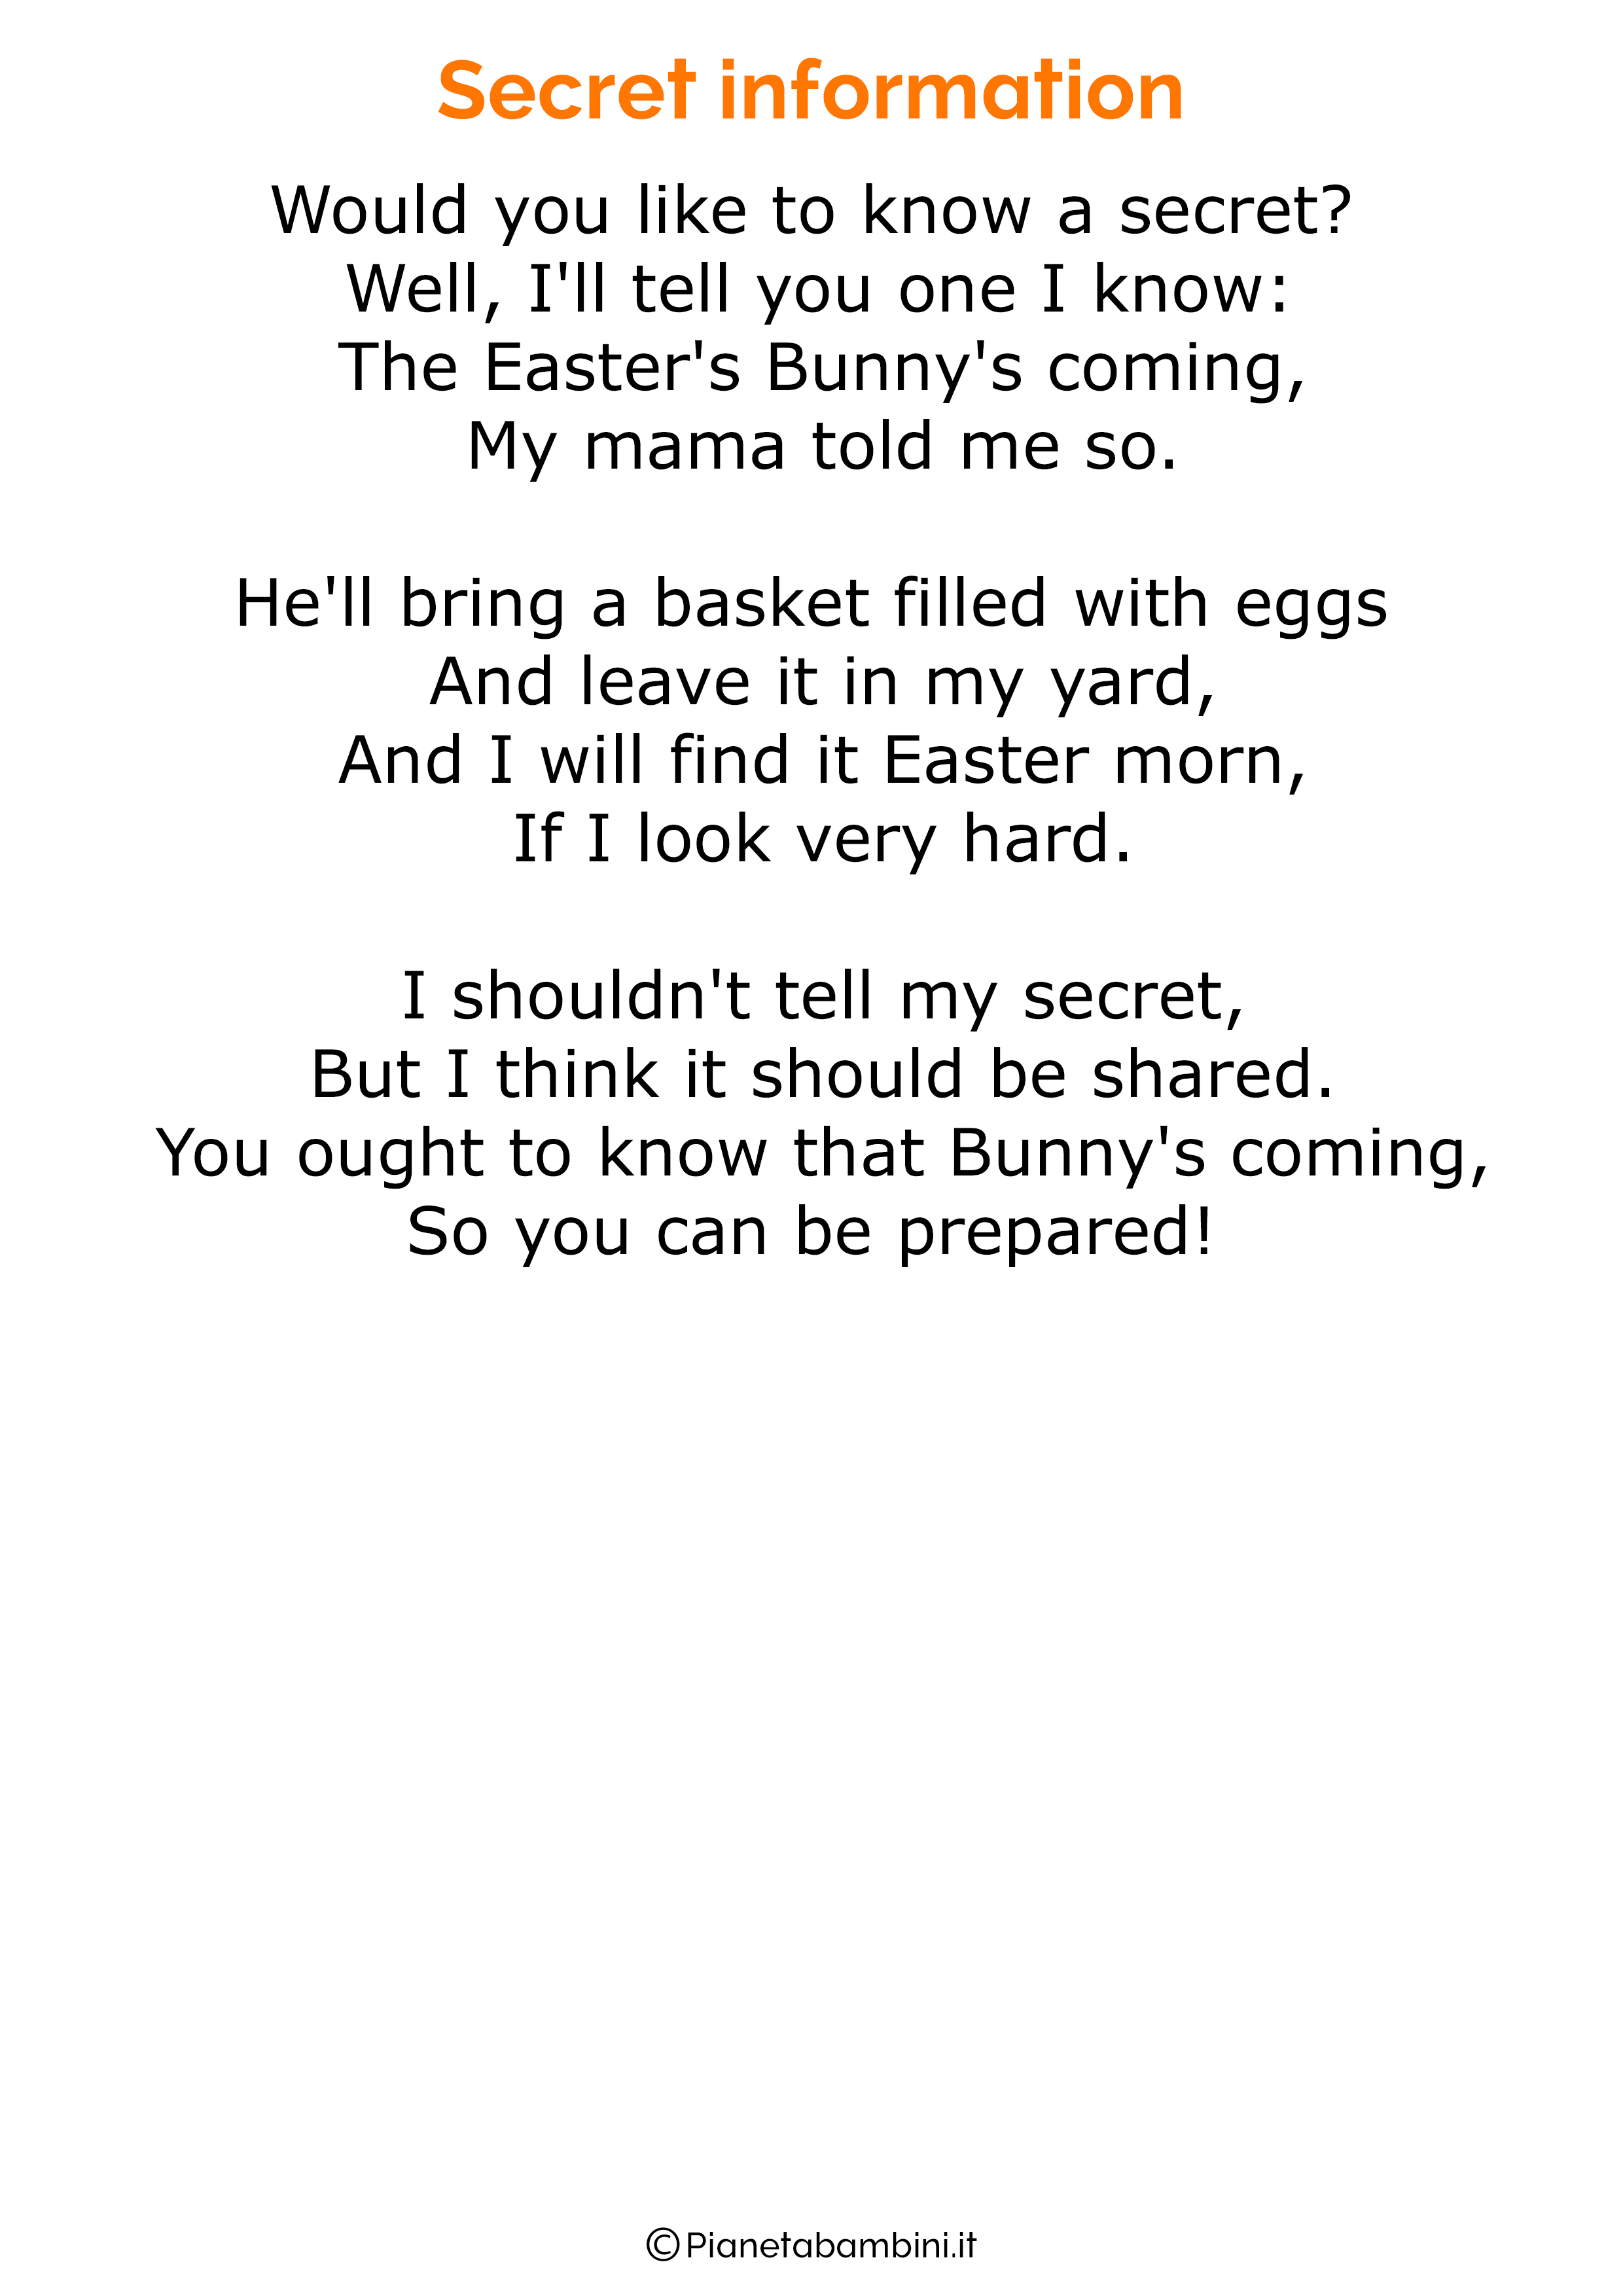 Poesie di Pasqua in inglese per bambini 23